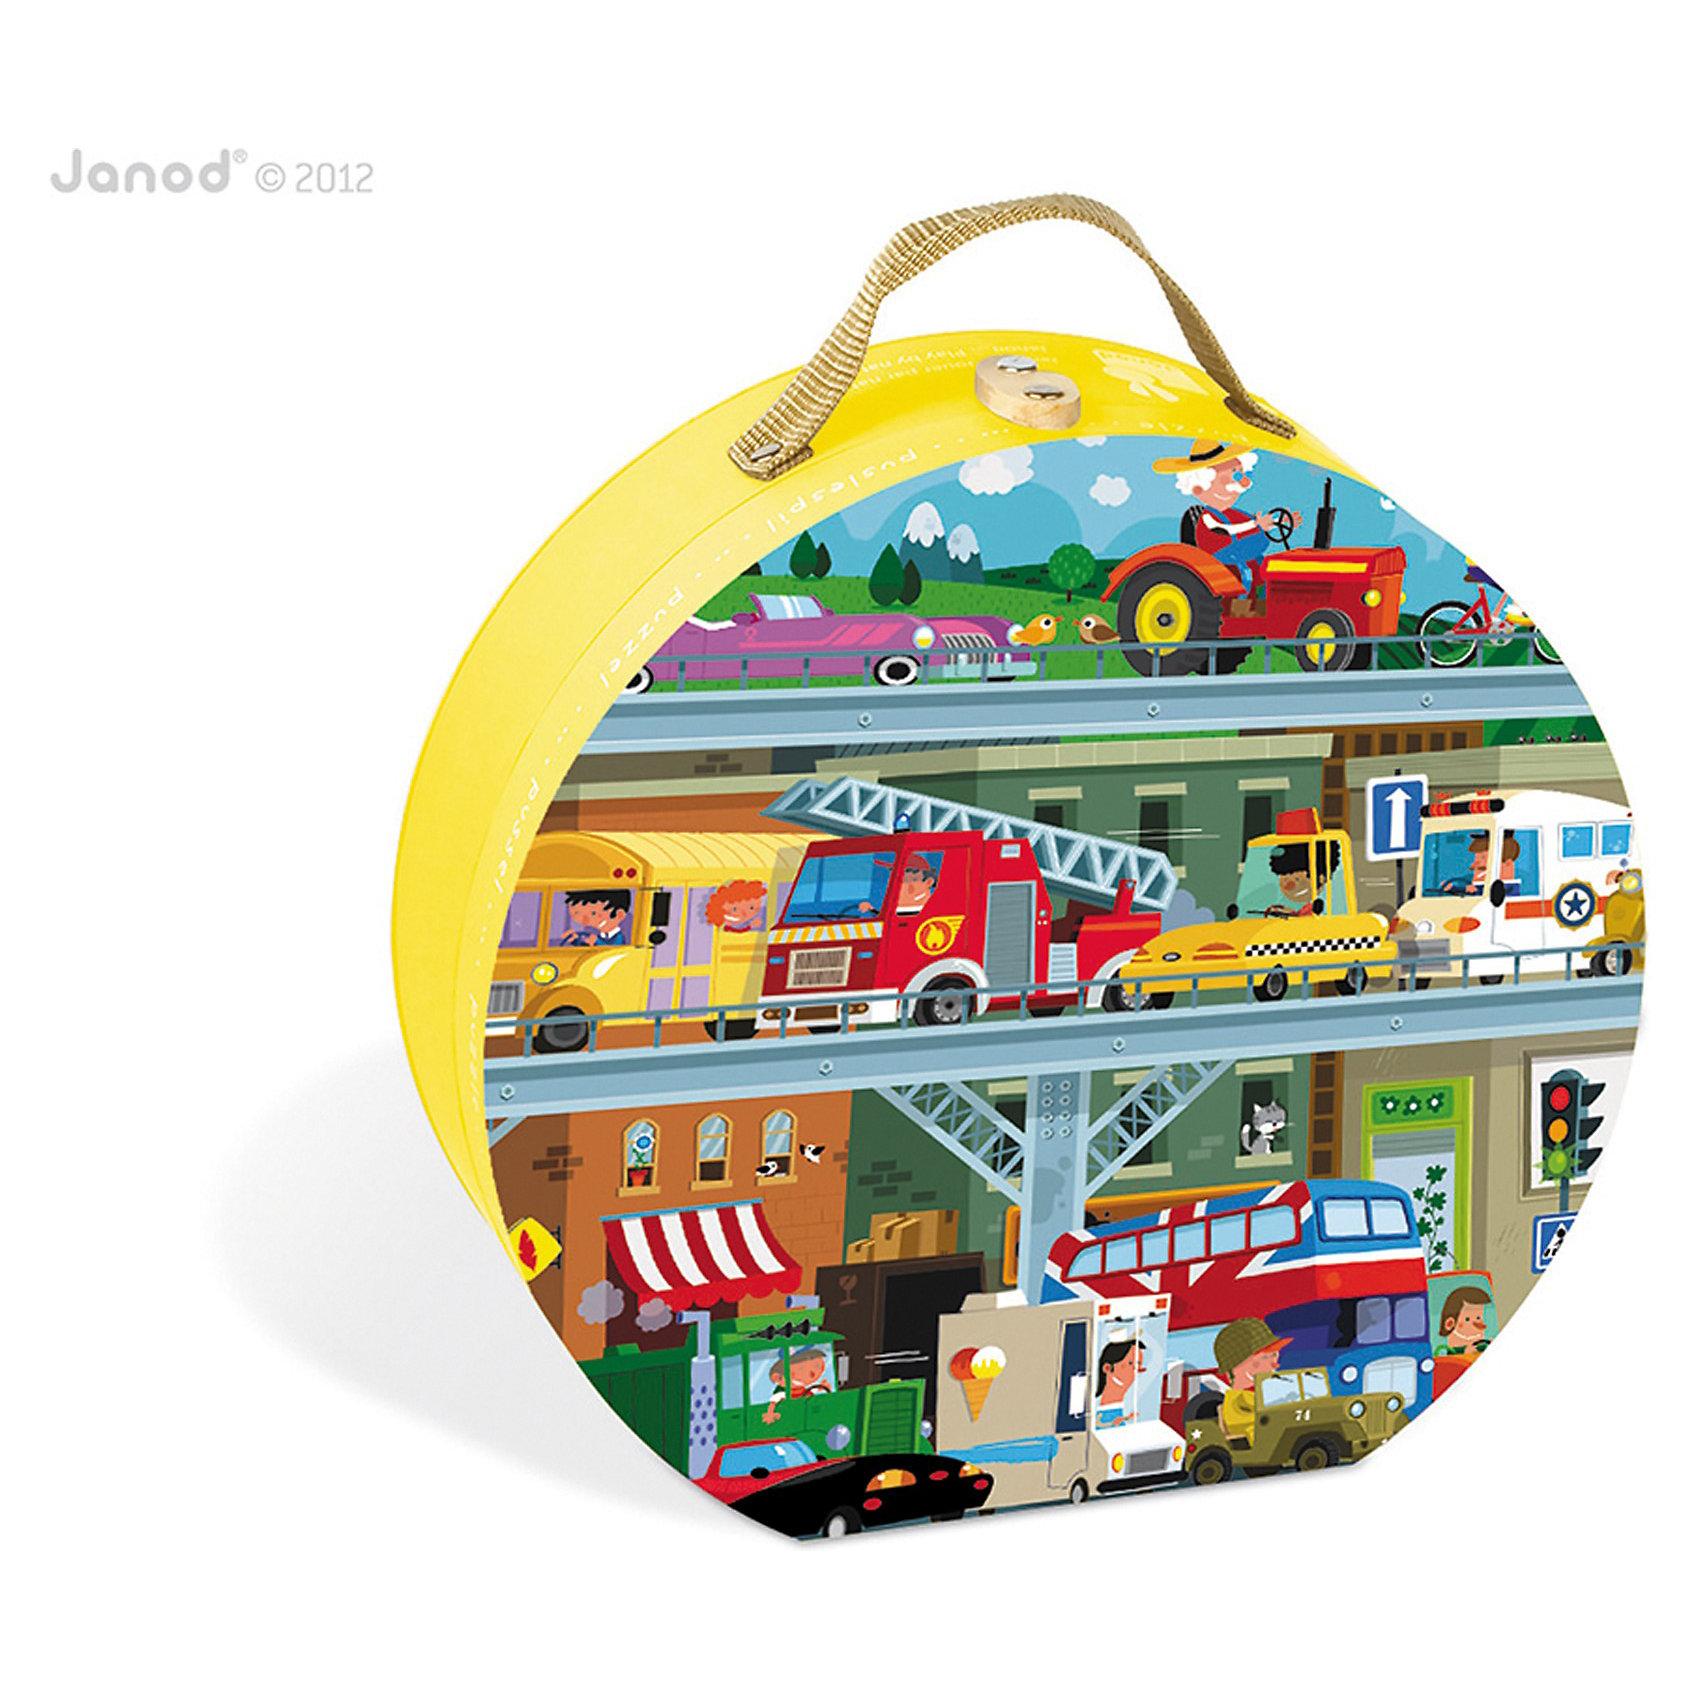 Janod Пазл в круглом чемоданчике Транспорт, 100 деталей, Janod janod пазл объемный семья зайчат 5эл